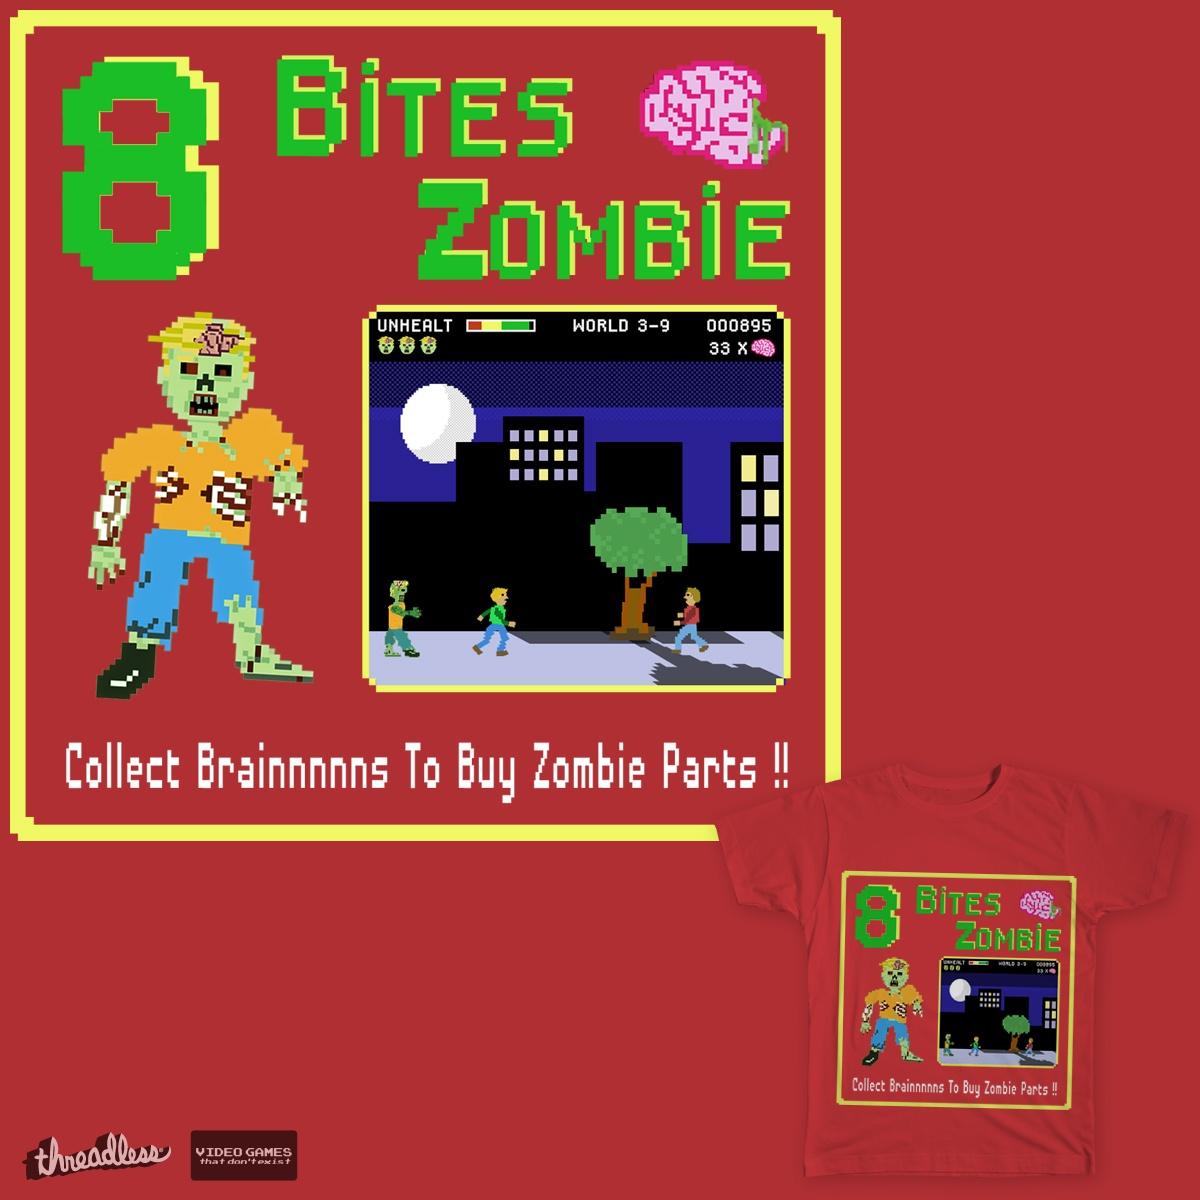 8 bites Zombie by S3Bizarre on Threadless